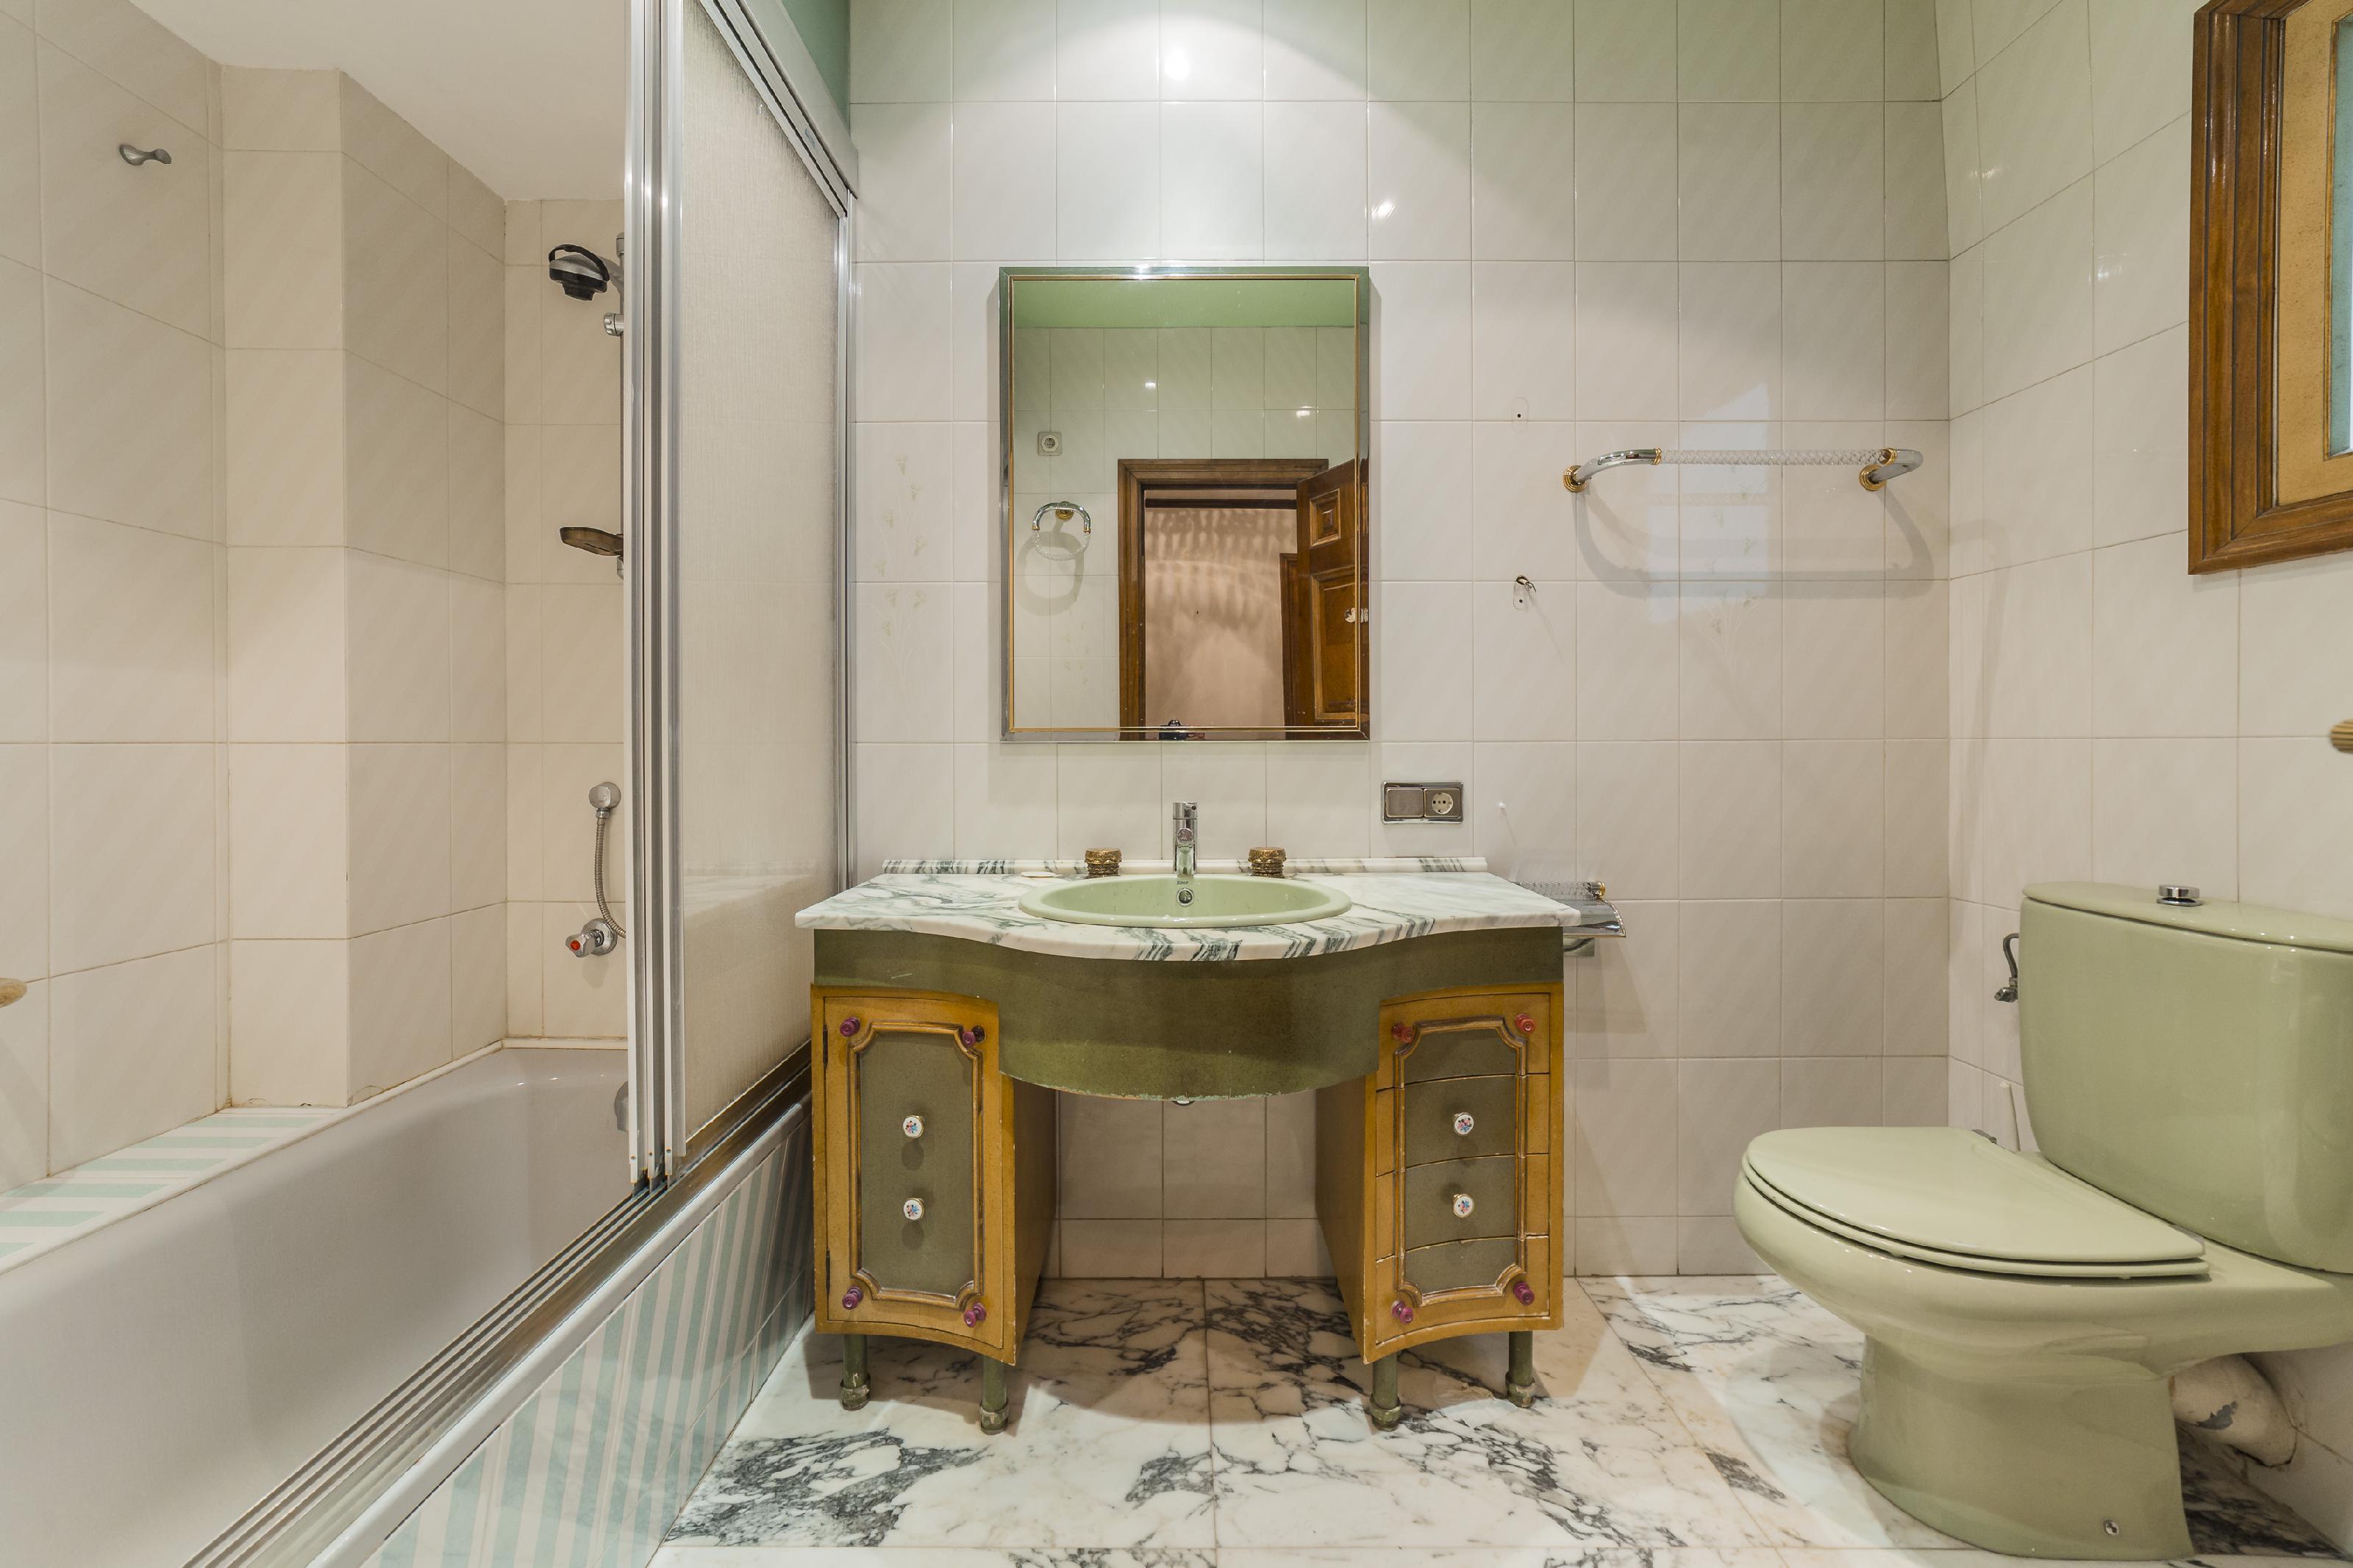 249314 Penthouse for sale in Sarrià-Sant Gervasi, Sant Gervasi-Galvany 17